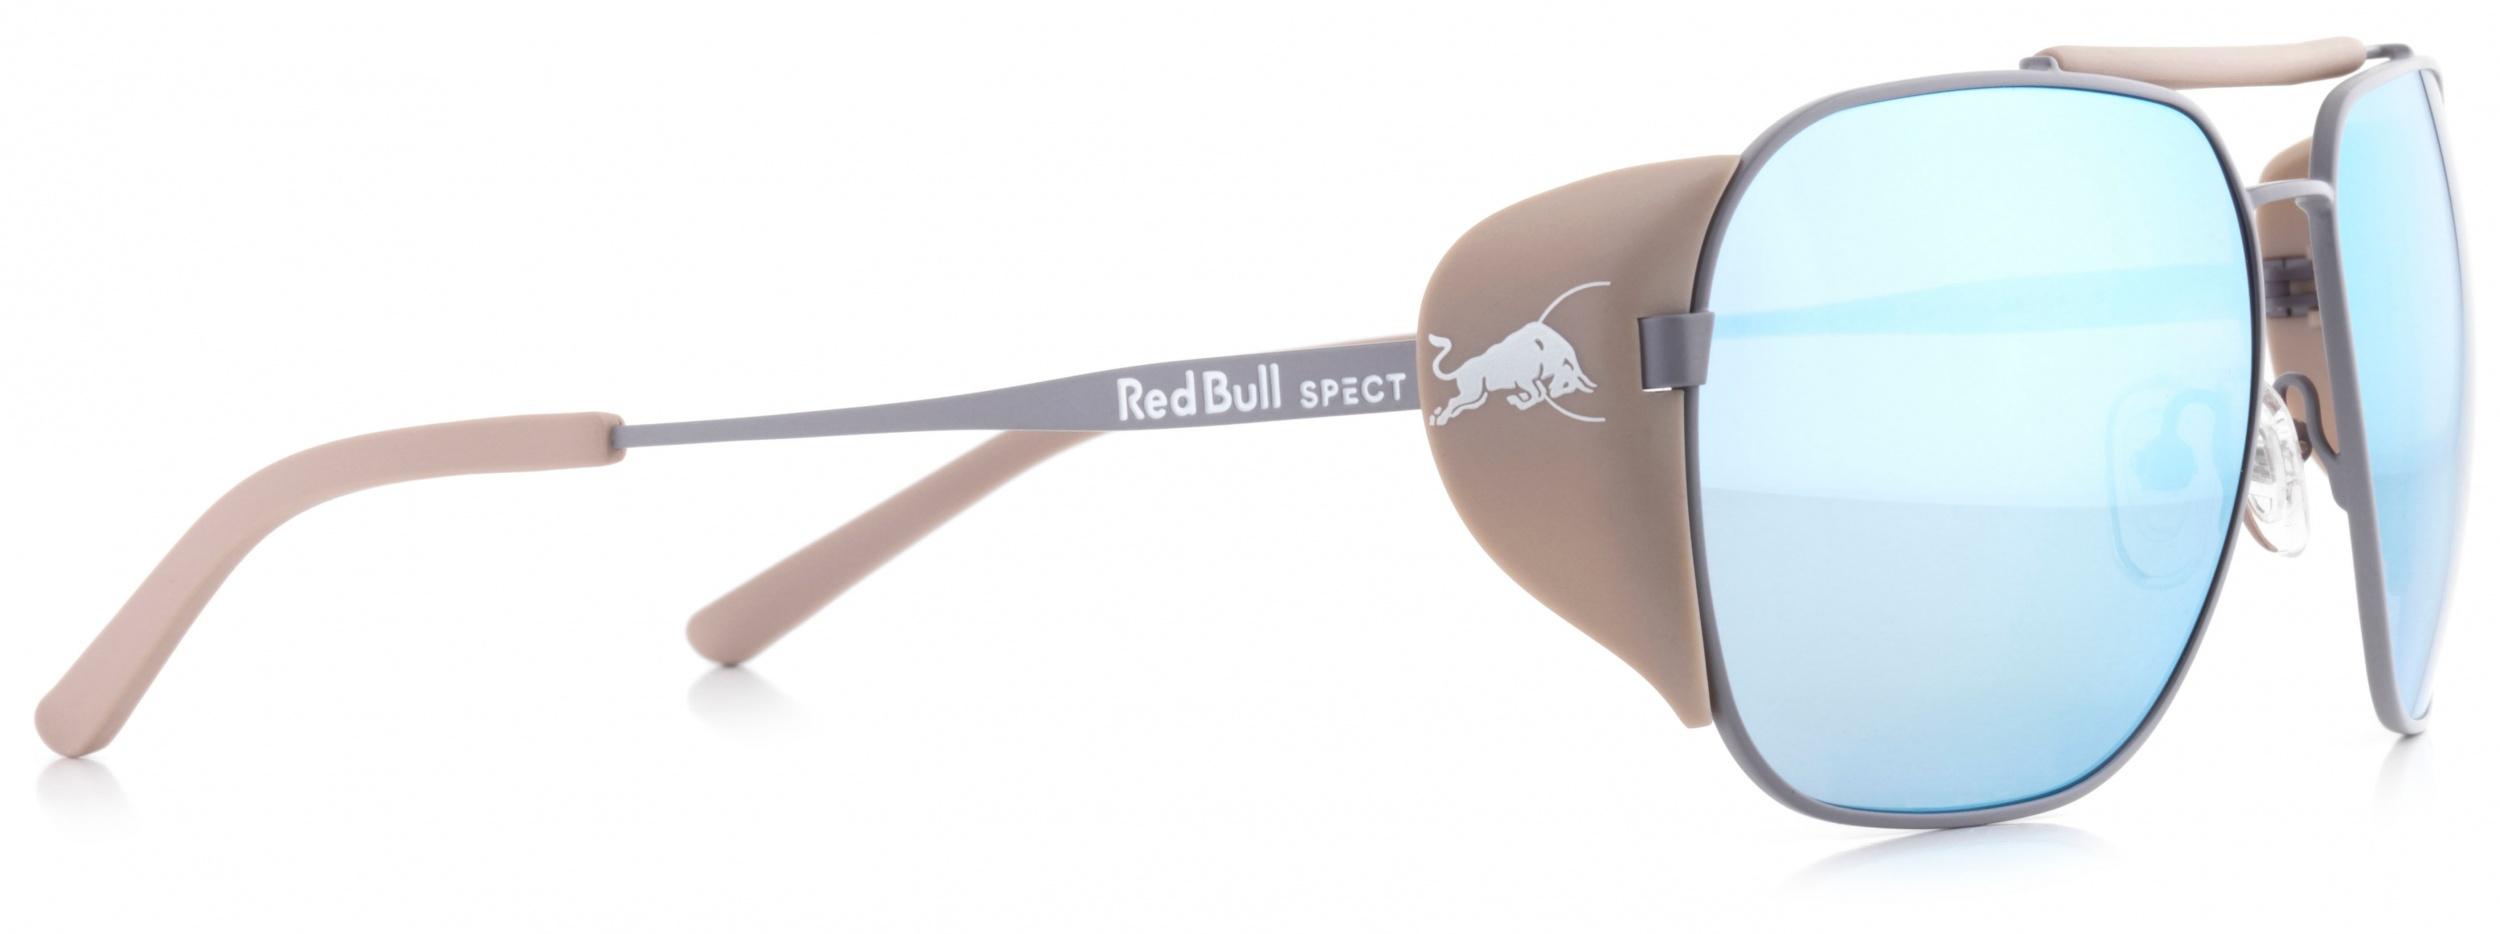 3c703afb5166 Red Bull Spect Eyewear sunglasses Pikespeak pilot grey/blue. Enlarge